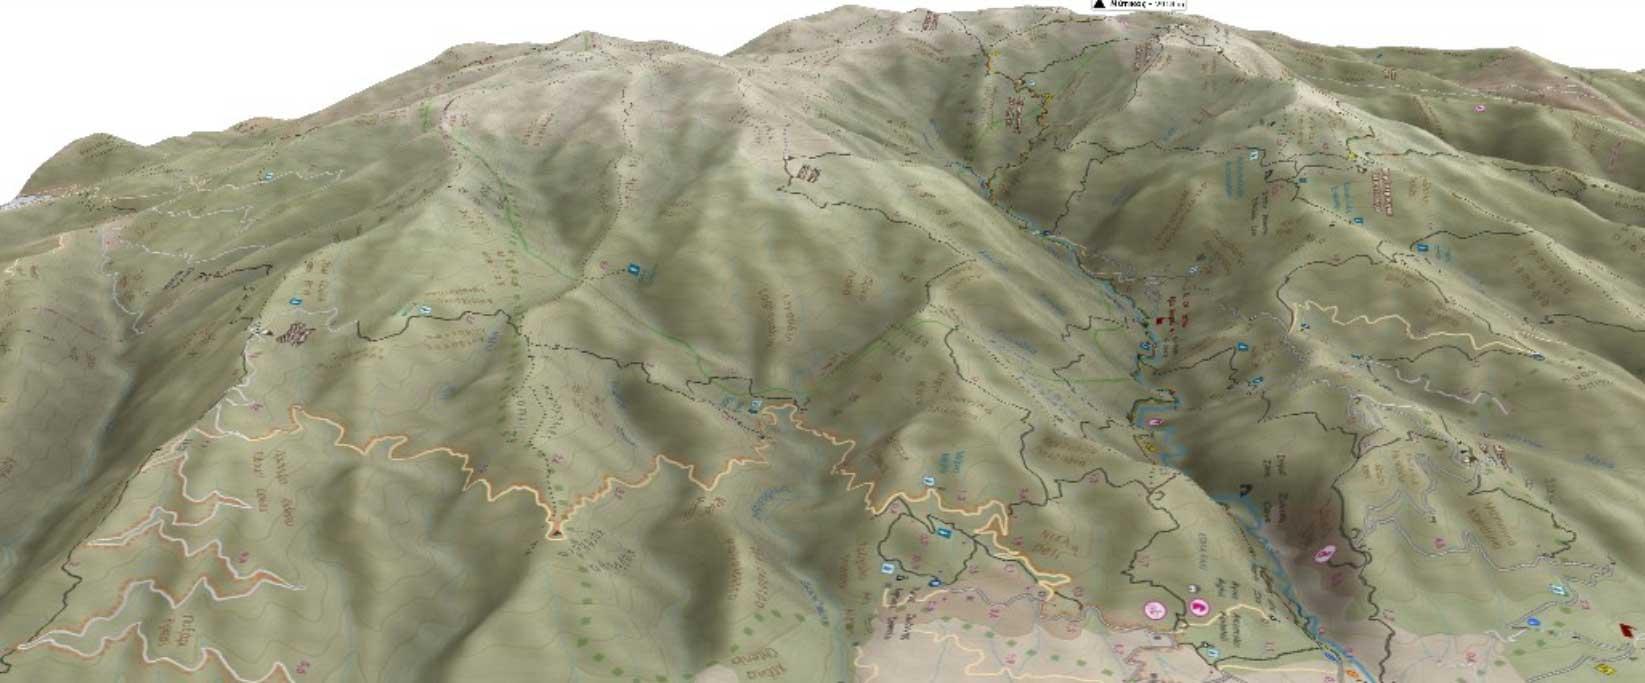 Yphresies Route Maps